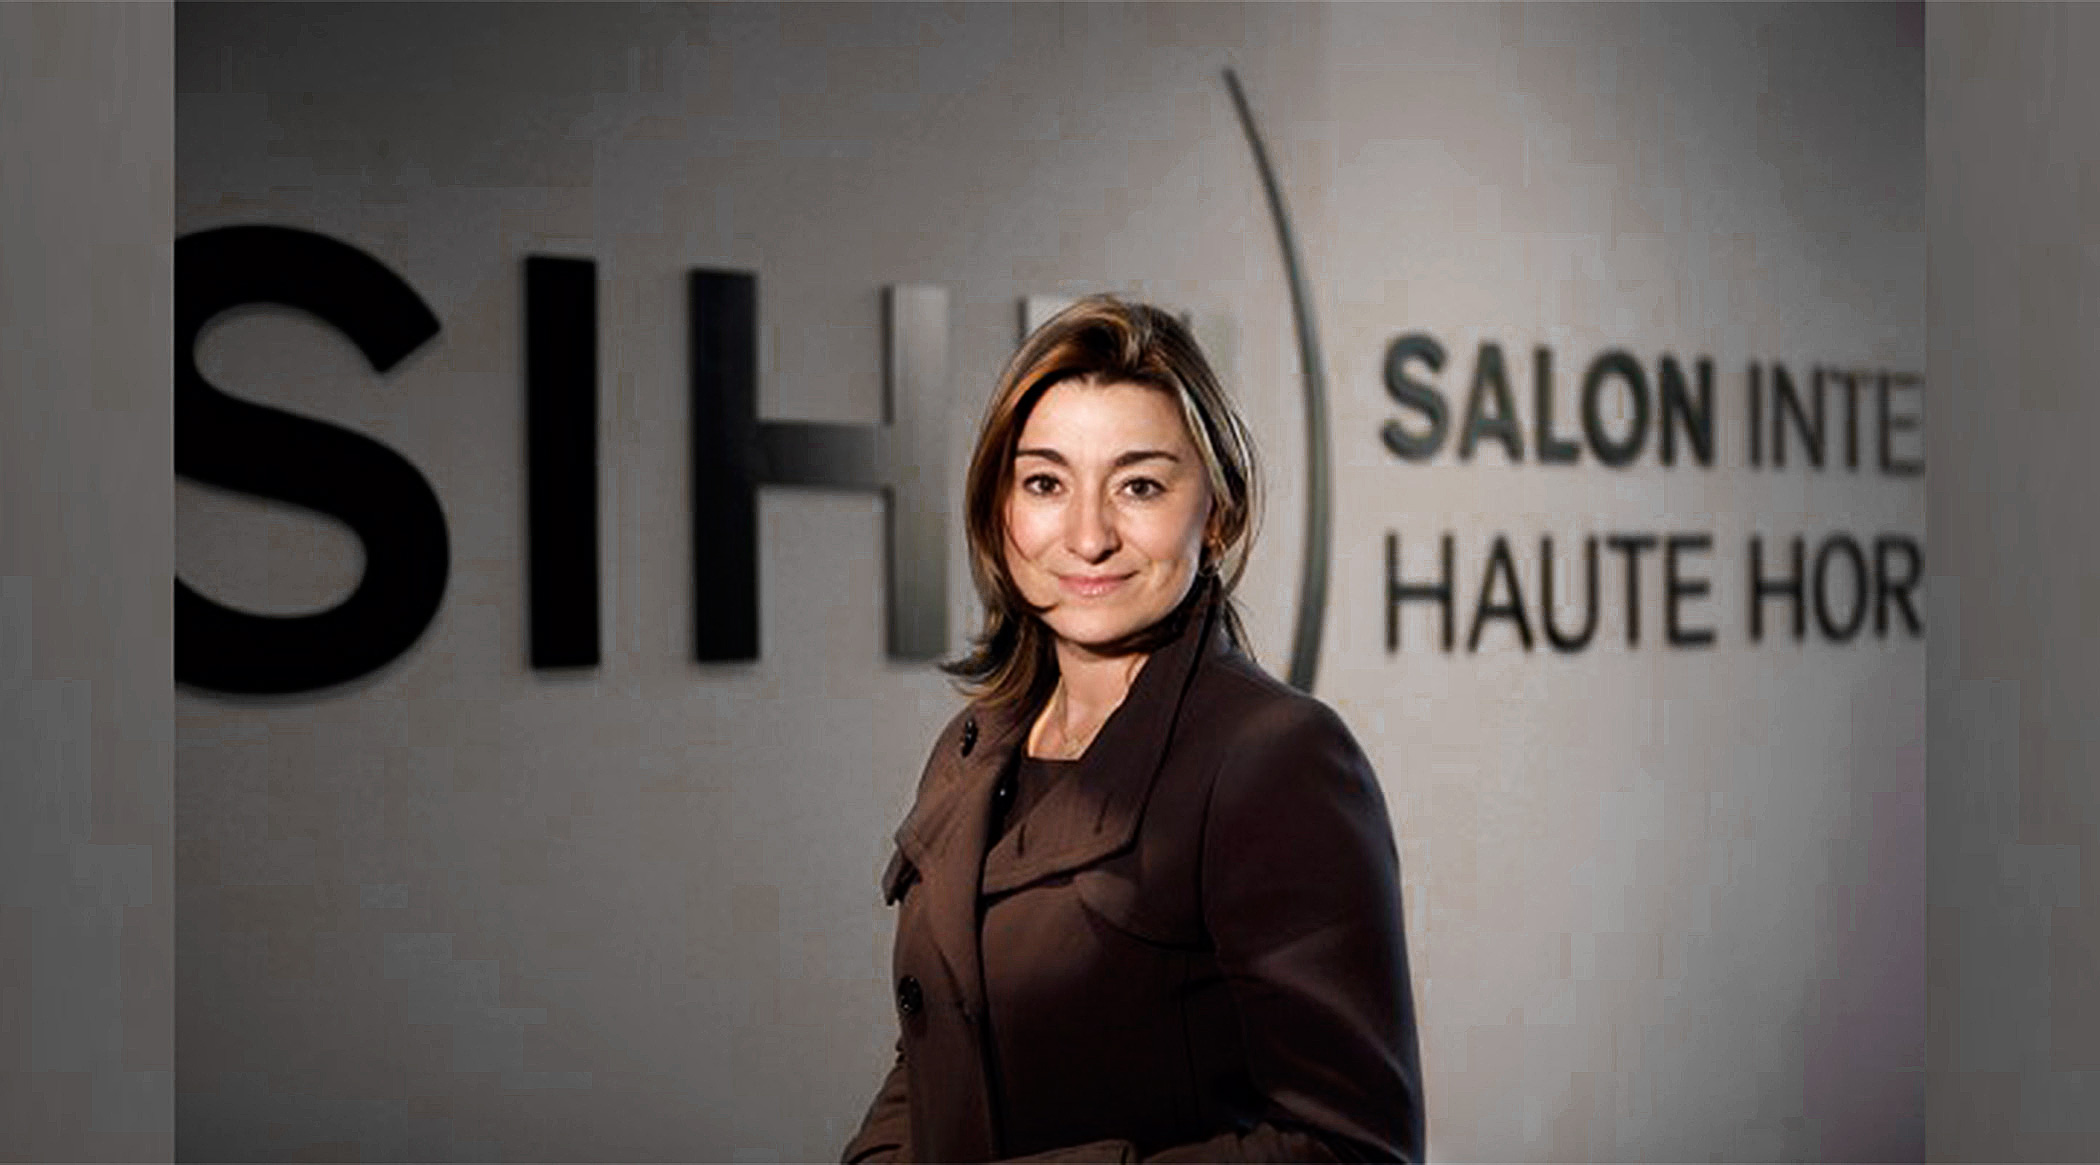 A whole new salon international de la haute horlogerie for Salon de la haute horlogerie